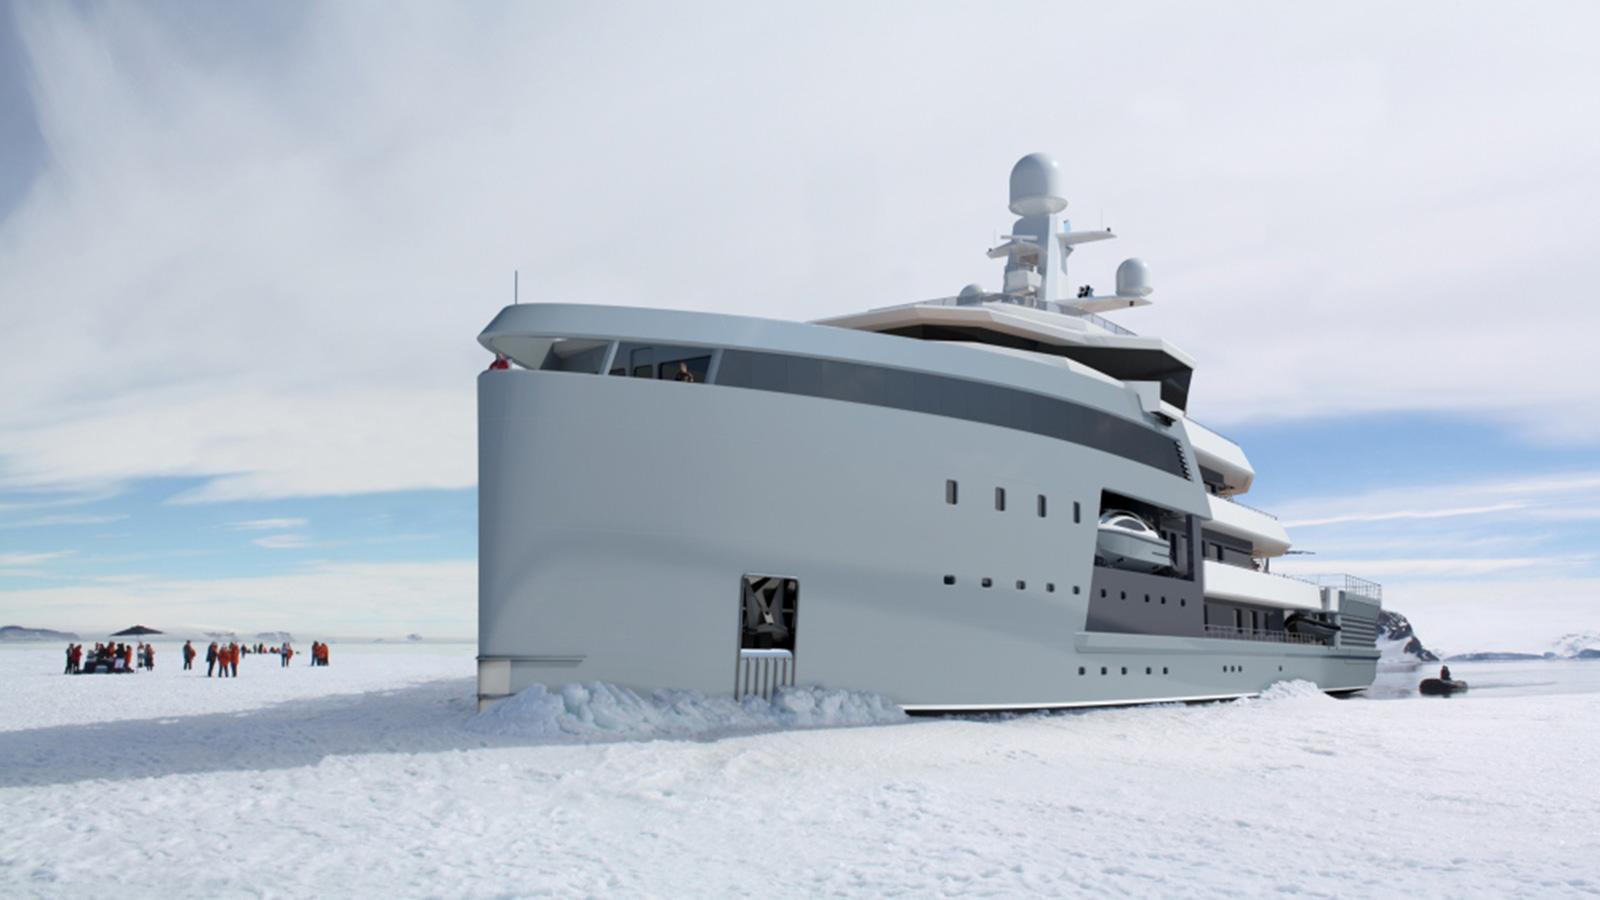 seaxplorer 65 motoryacht damen 2019 65m half profile rendering